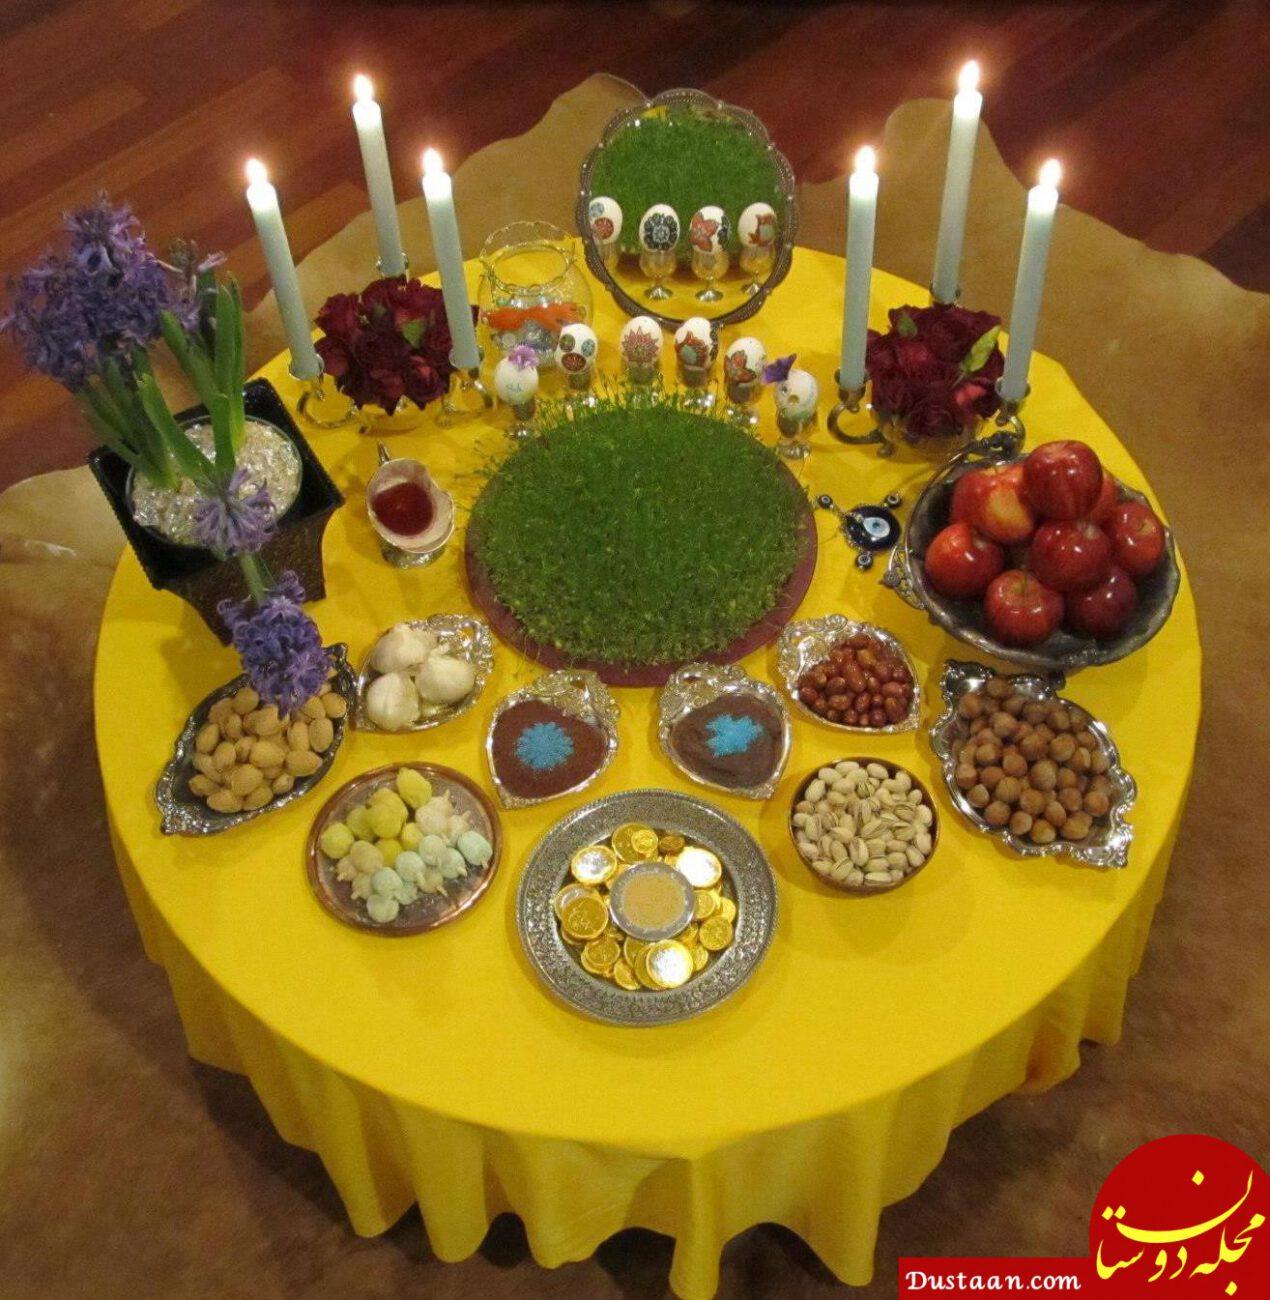 www.dustaan.com فرهنگ دید و بازدید عید